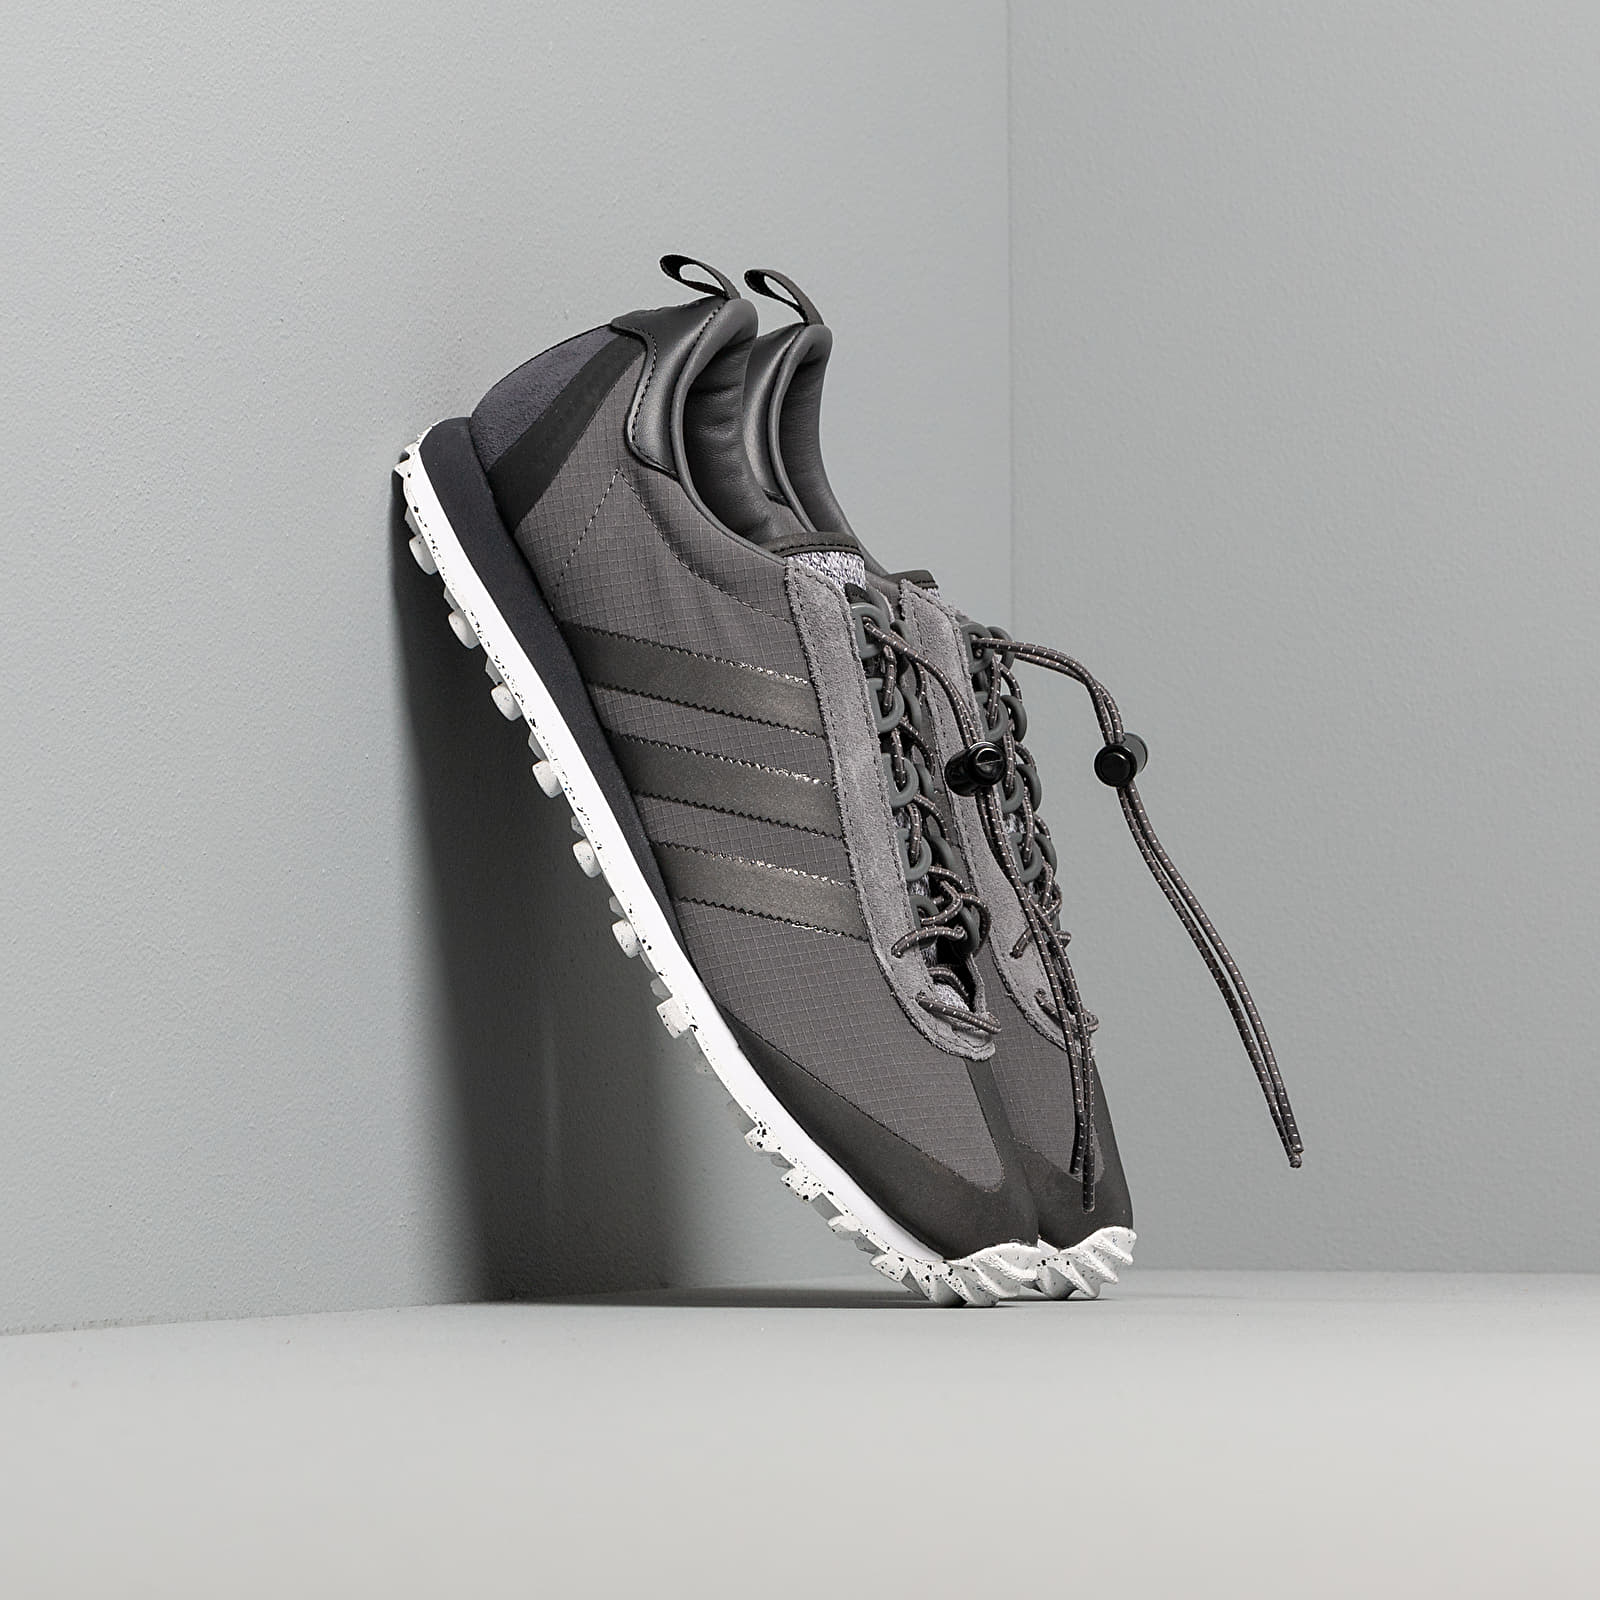 adidas Nite Jogger OG 3M